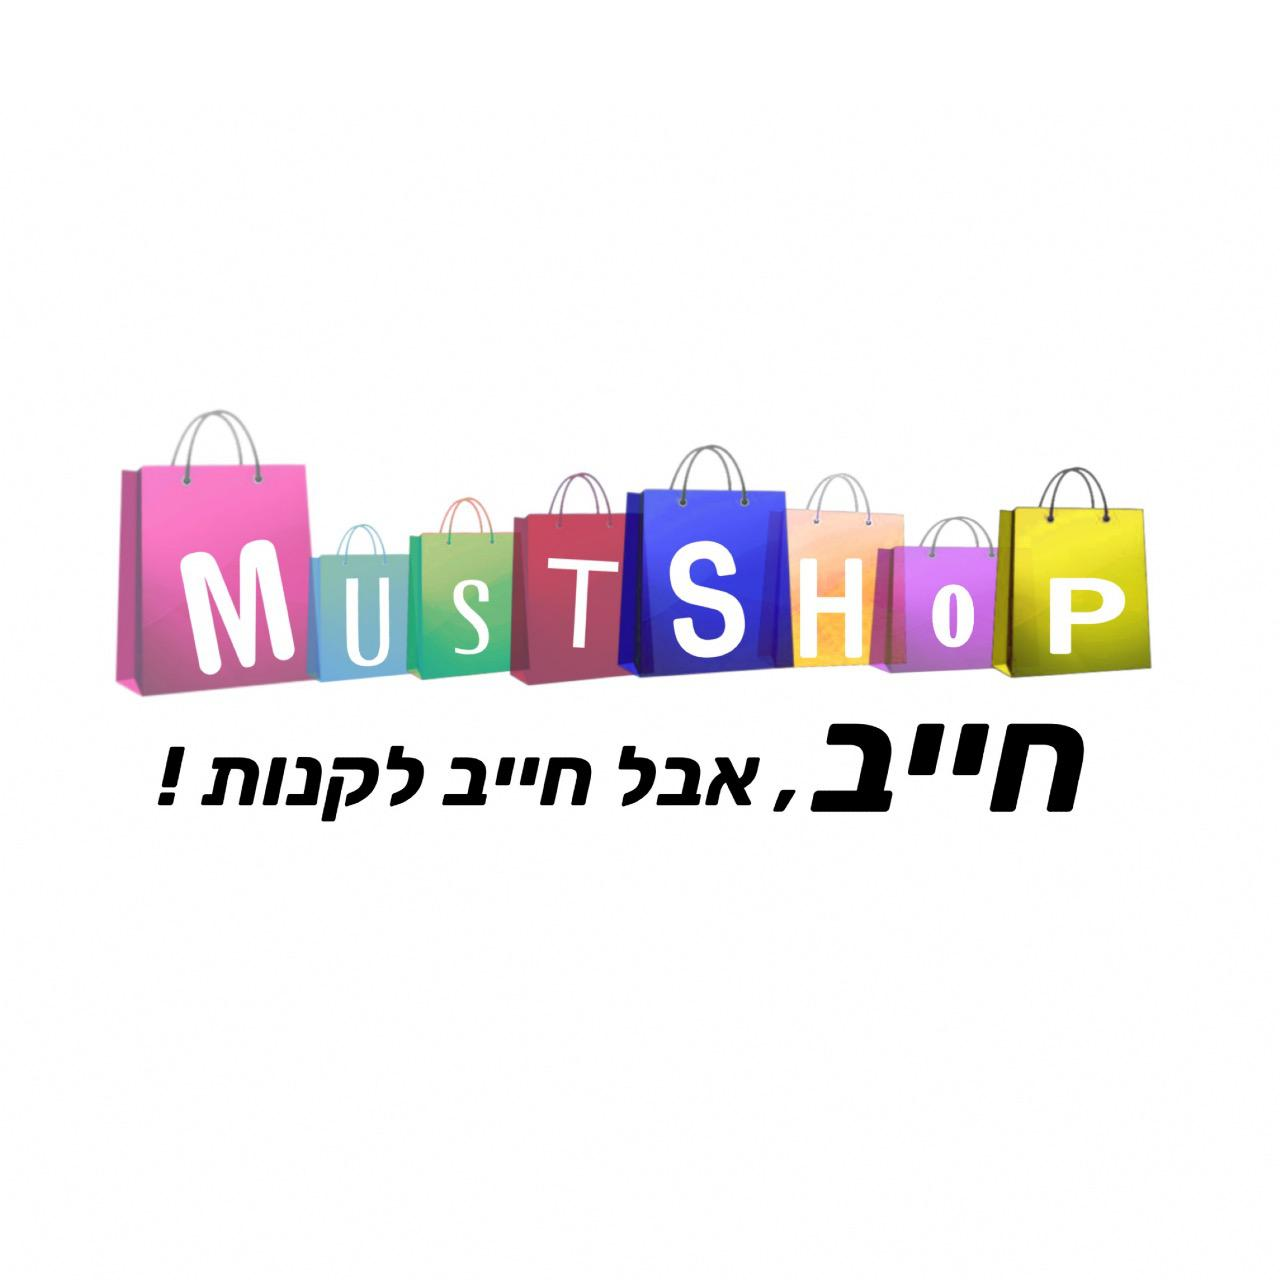 Mustshop ישראל לוגו